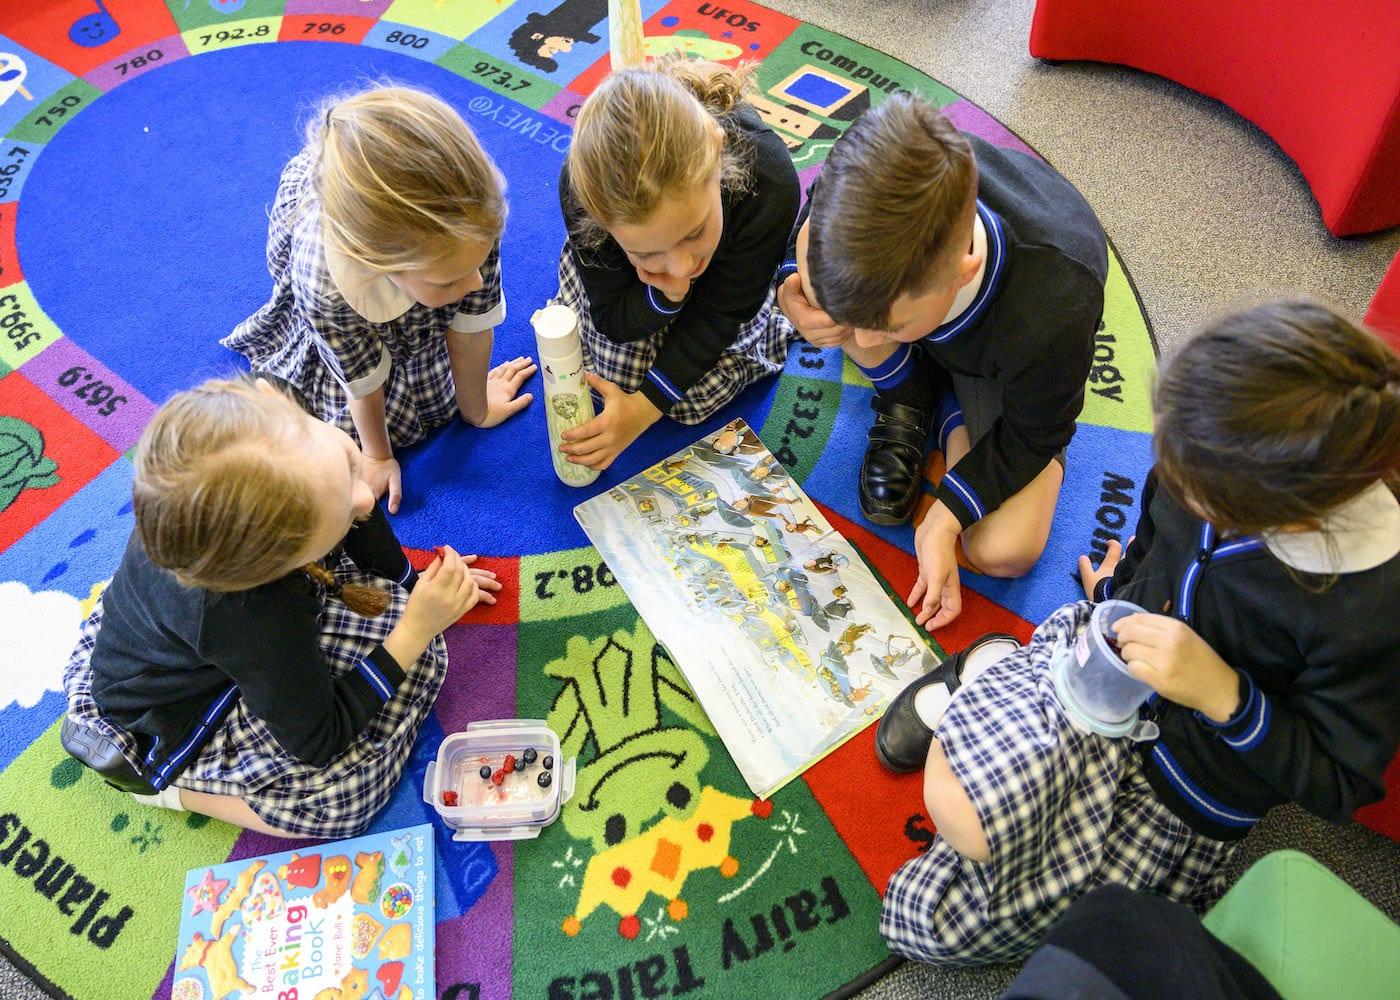 Brighton College | Is preschool really worth it?